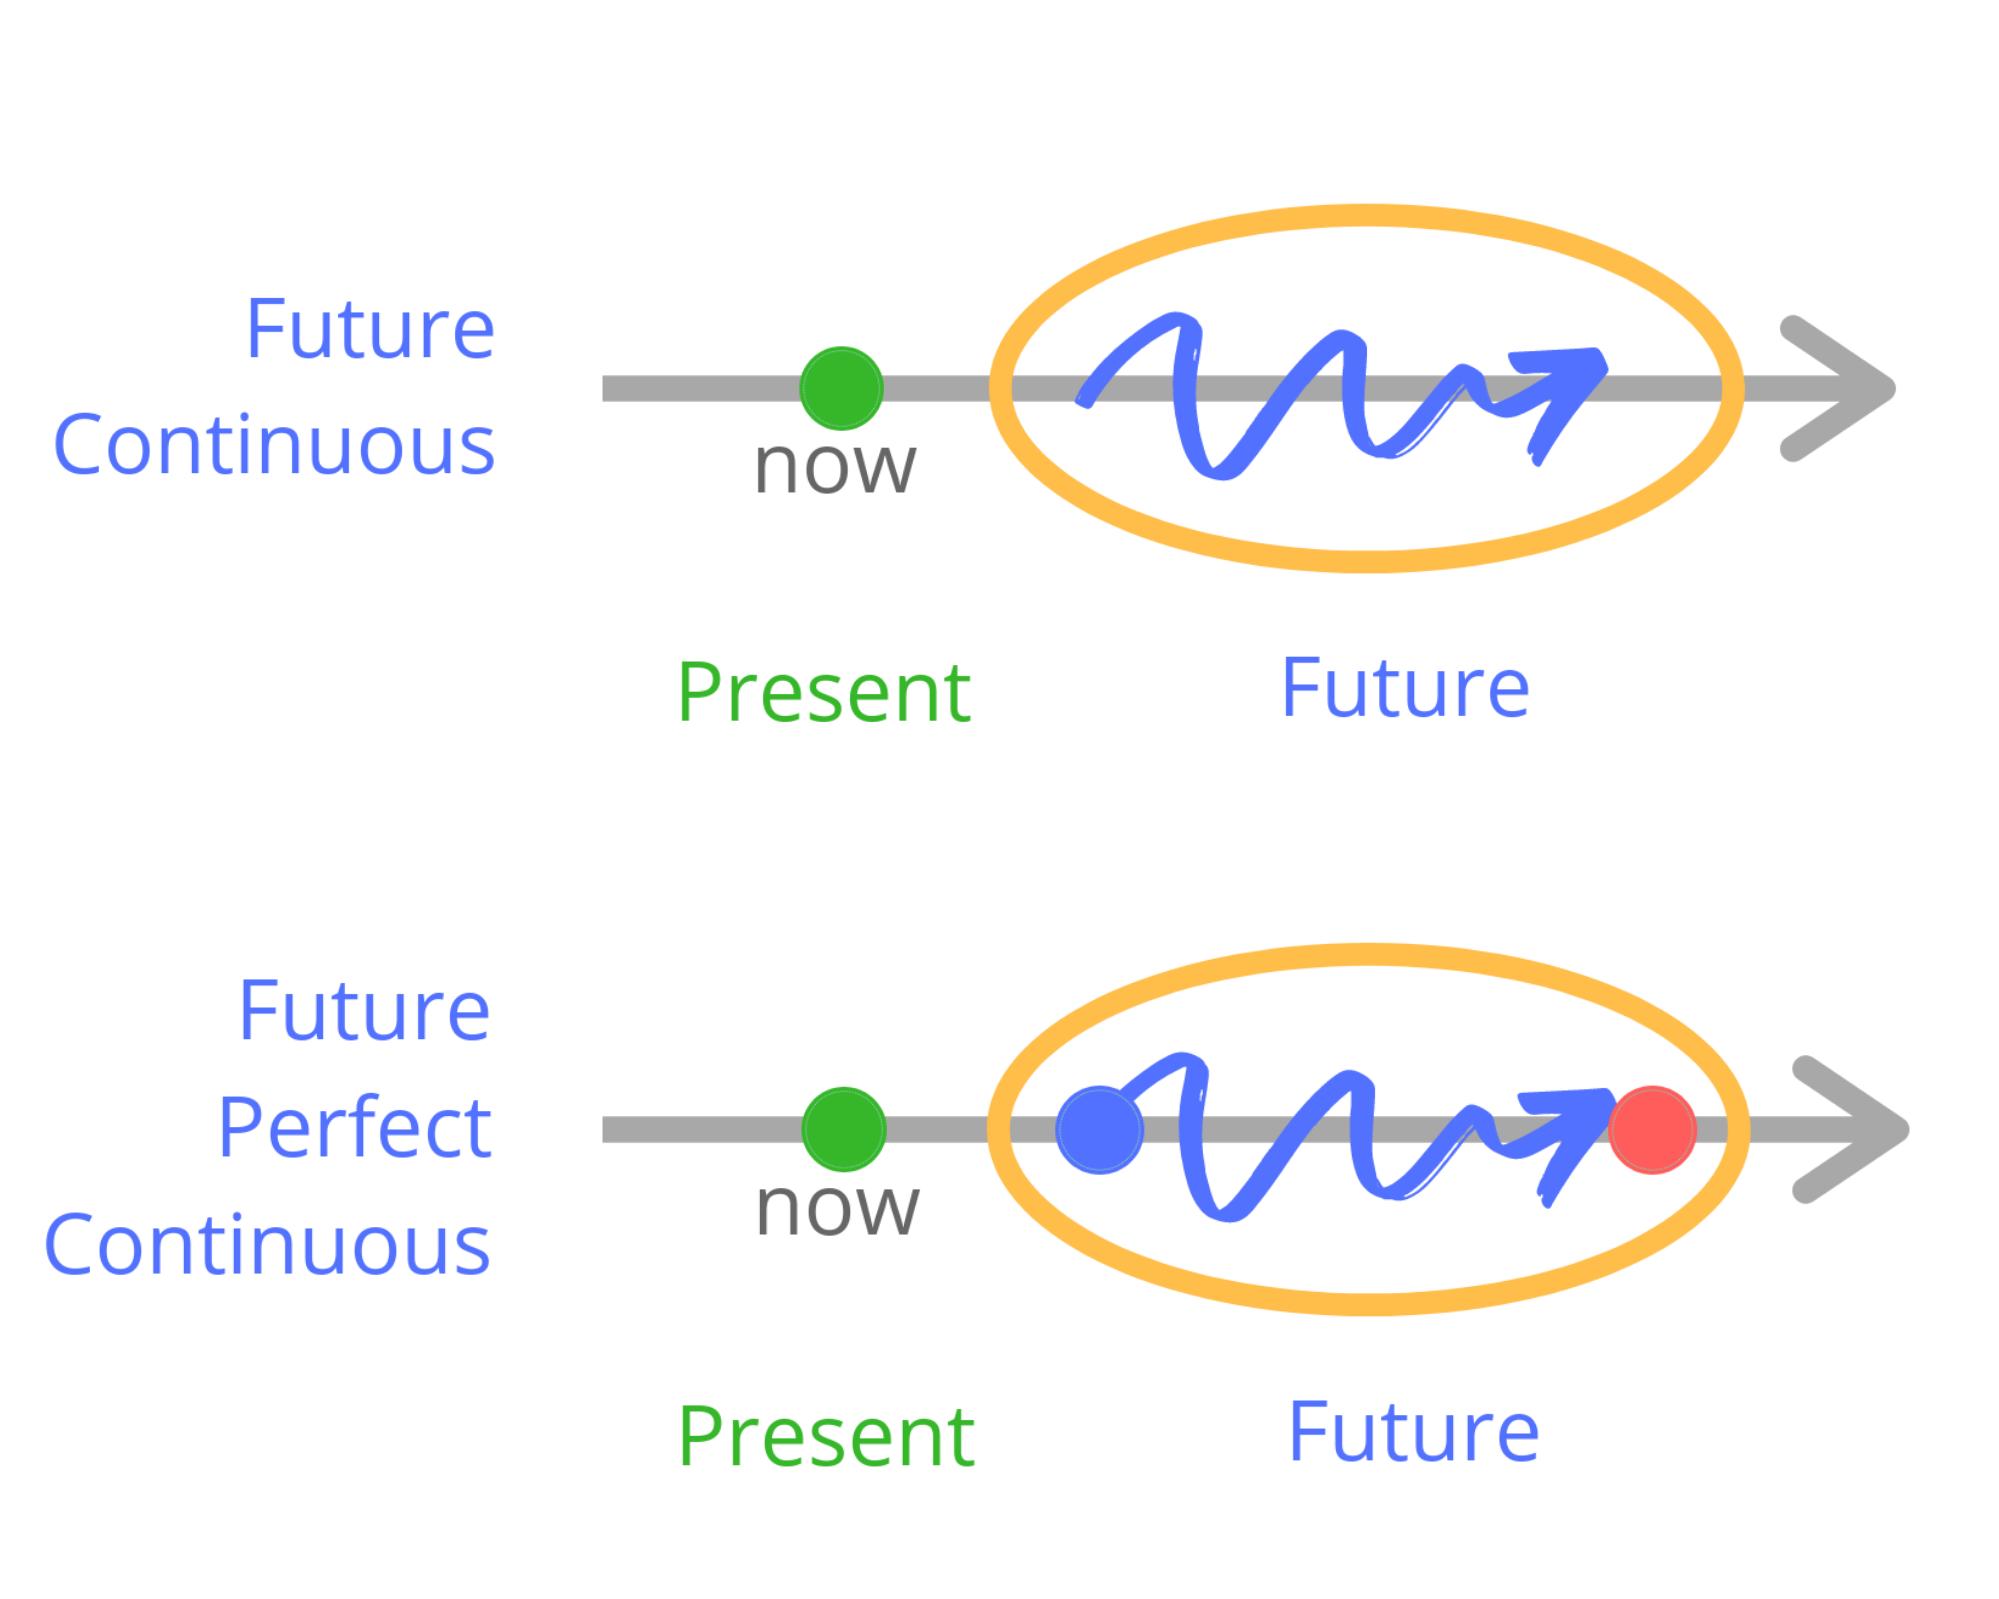 Порівняння Future Continuous і Future Perfect Continuous